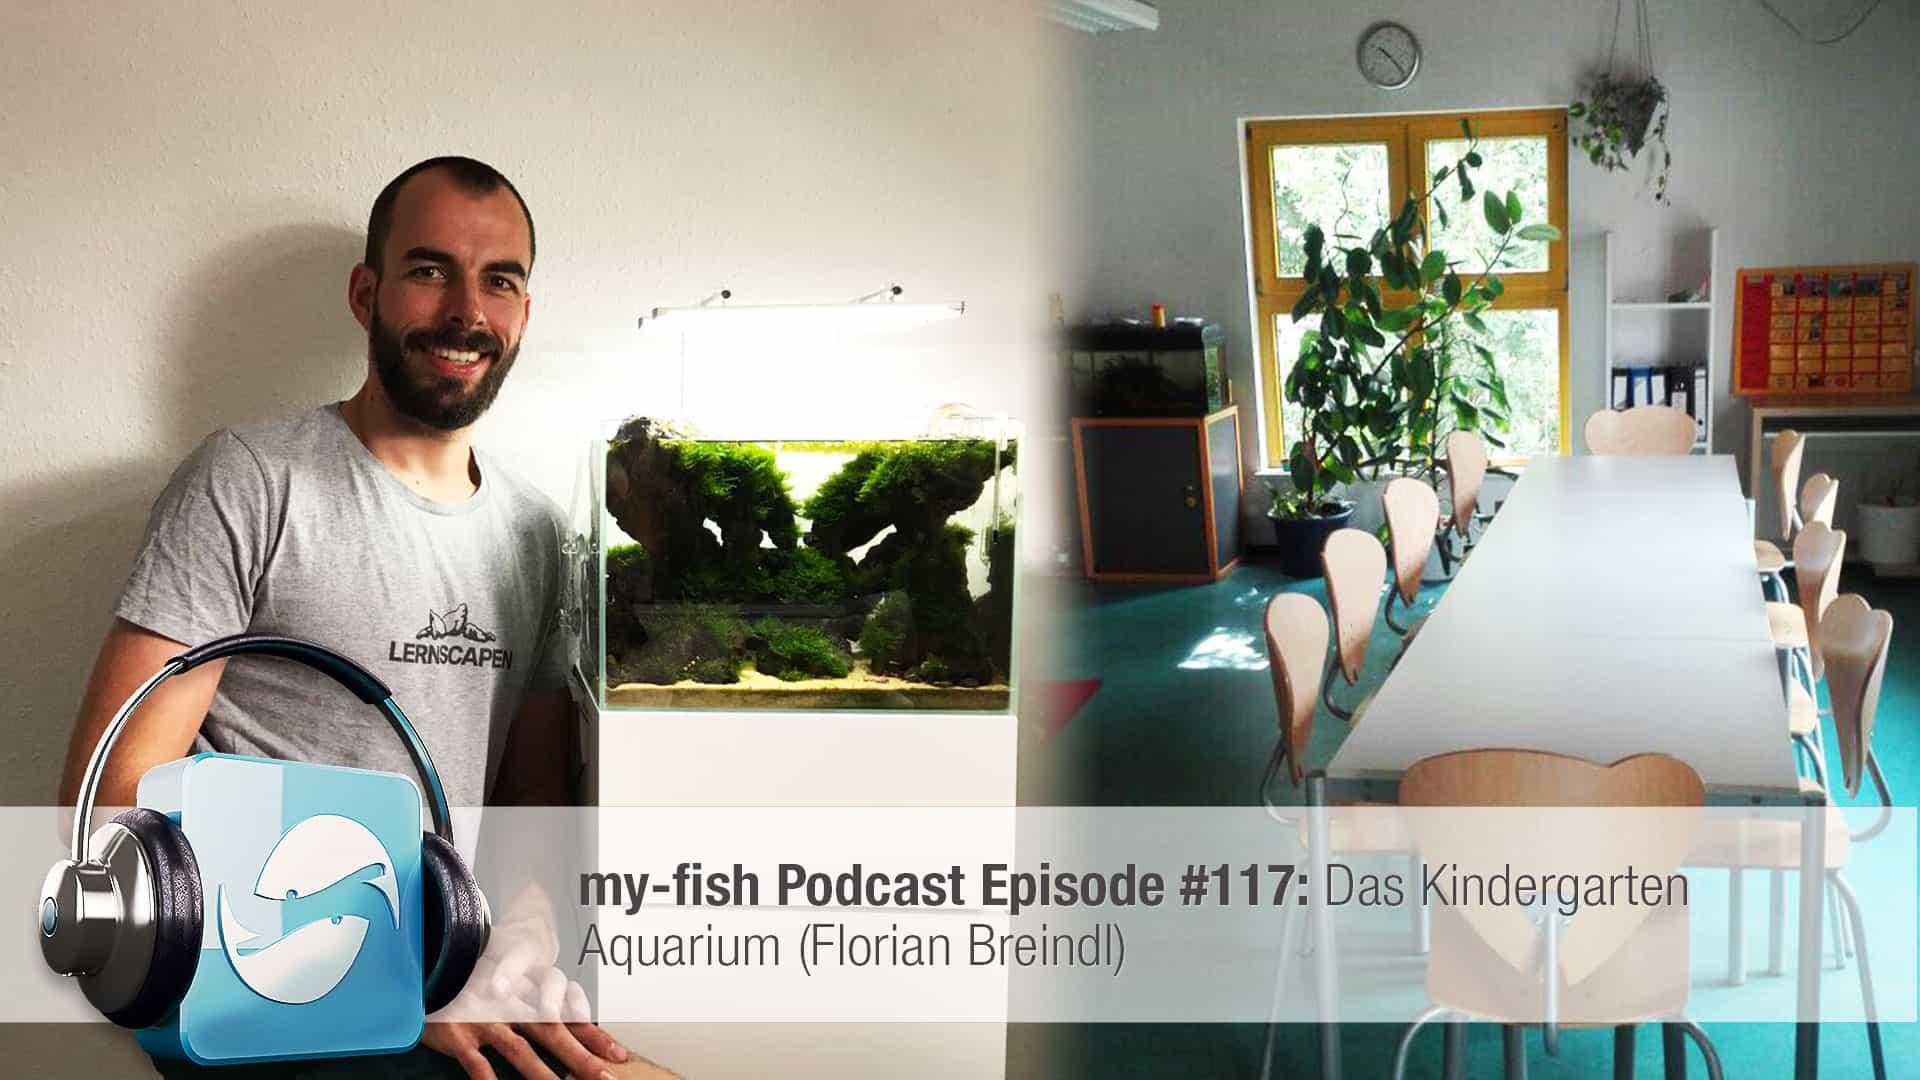 Podcast Episode #117: Das Kindergarten Aquarium (Florian Breindl) 1